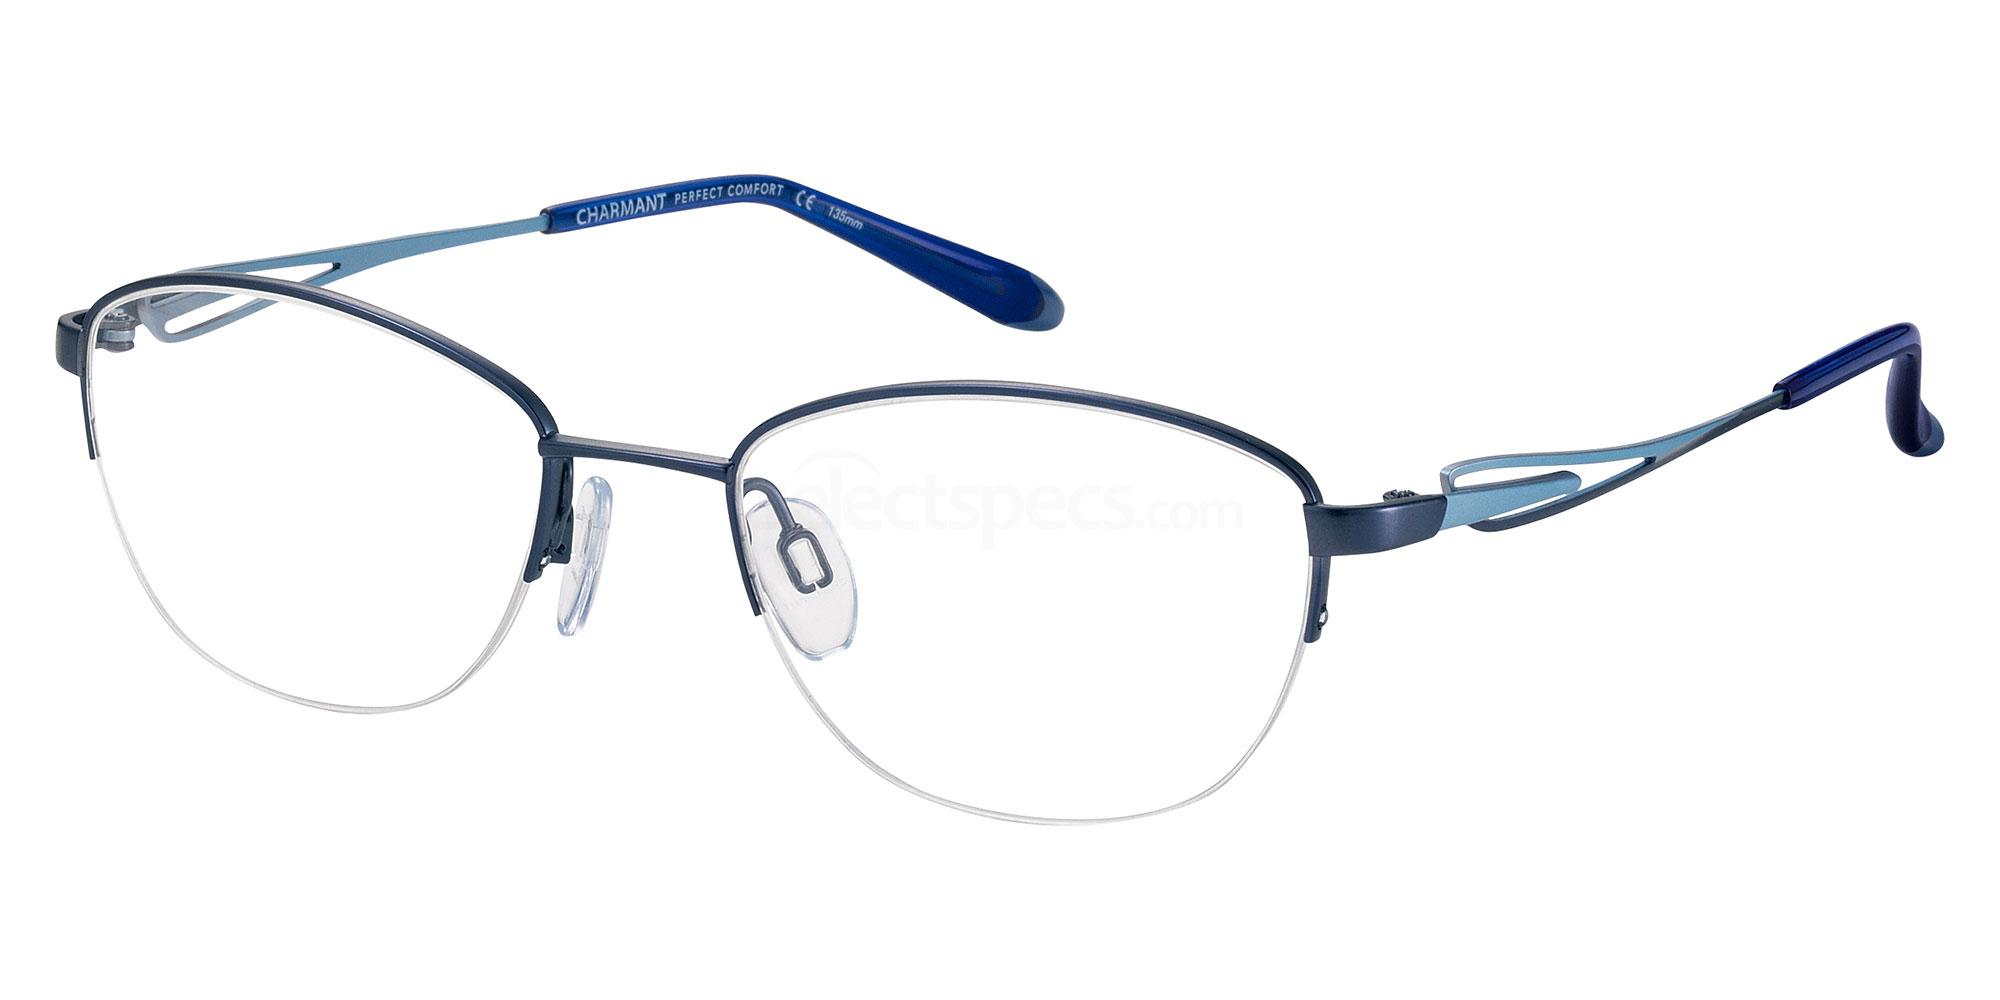 BL CH29601 Glasses, Charmant Perfect Comfort